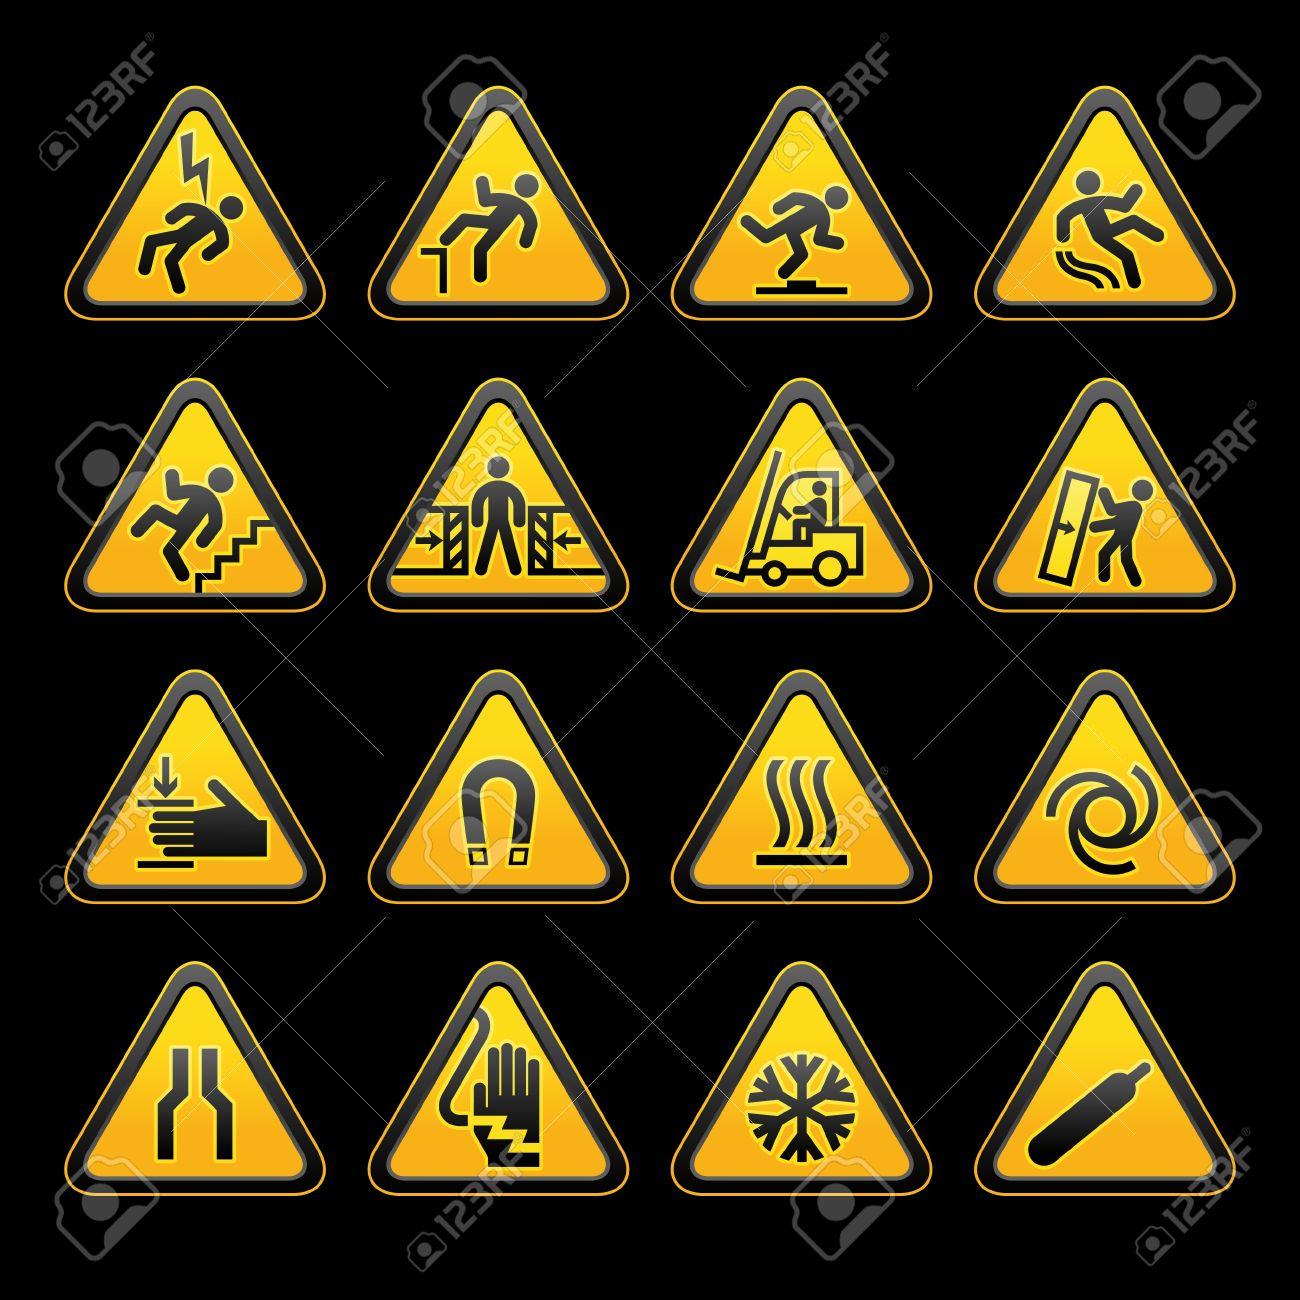 Set simple triangular warning symbols Hazard Signs Stock Vector - 11531567